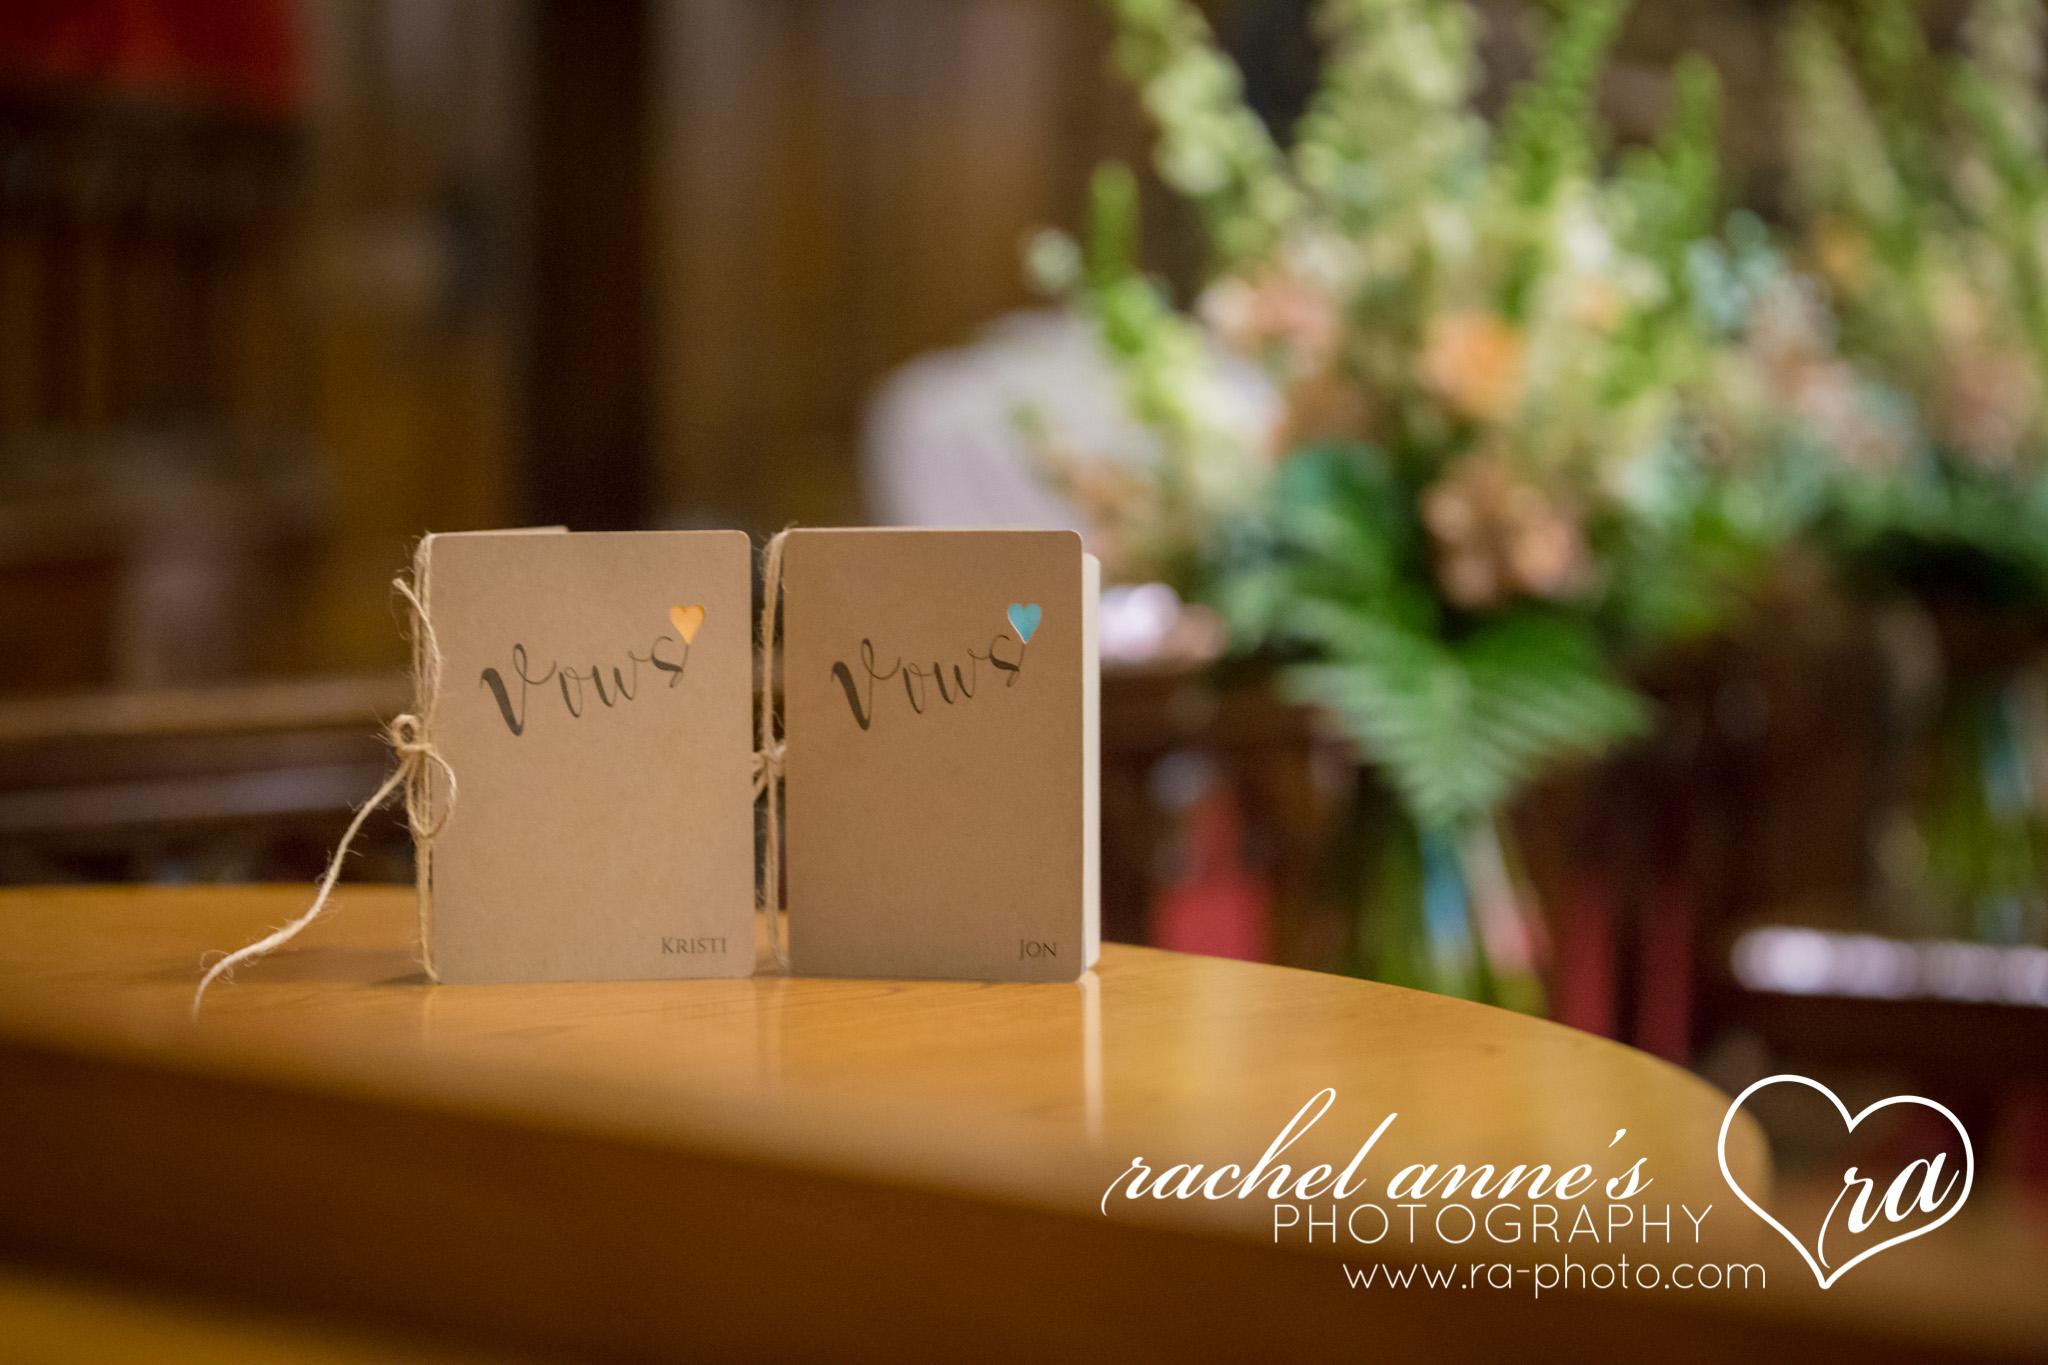 016-JKS-WEDDINGS-THE-FRANKLIN-PA.jpg